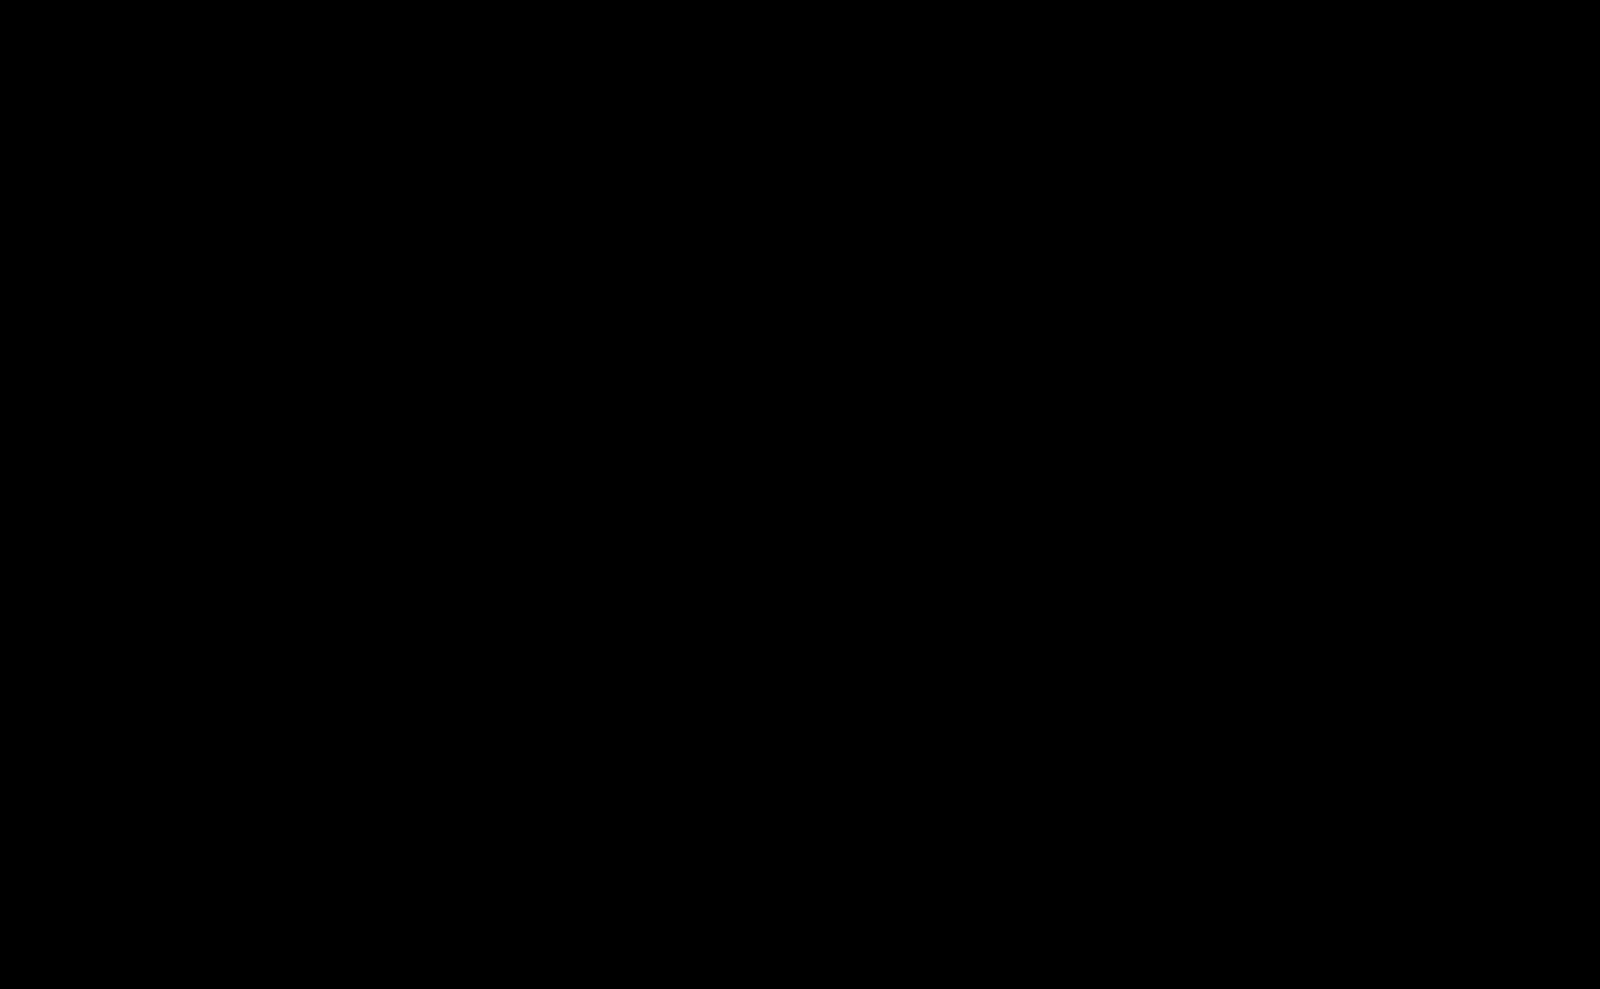 polygon grid by glitchworlds on deviantart